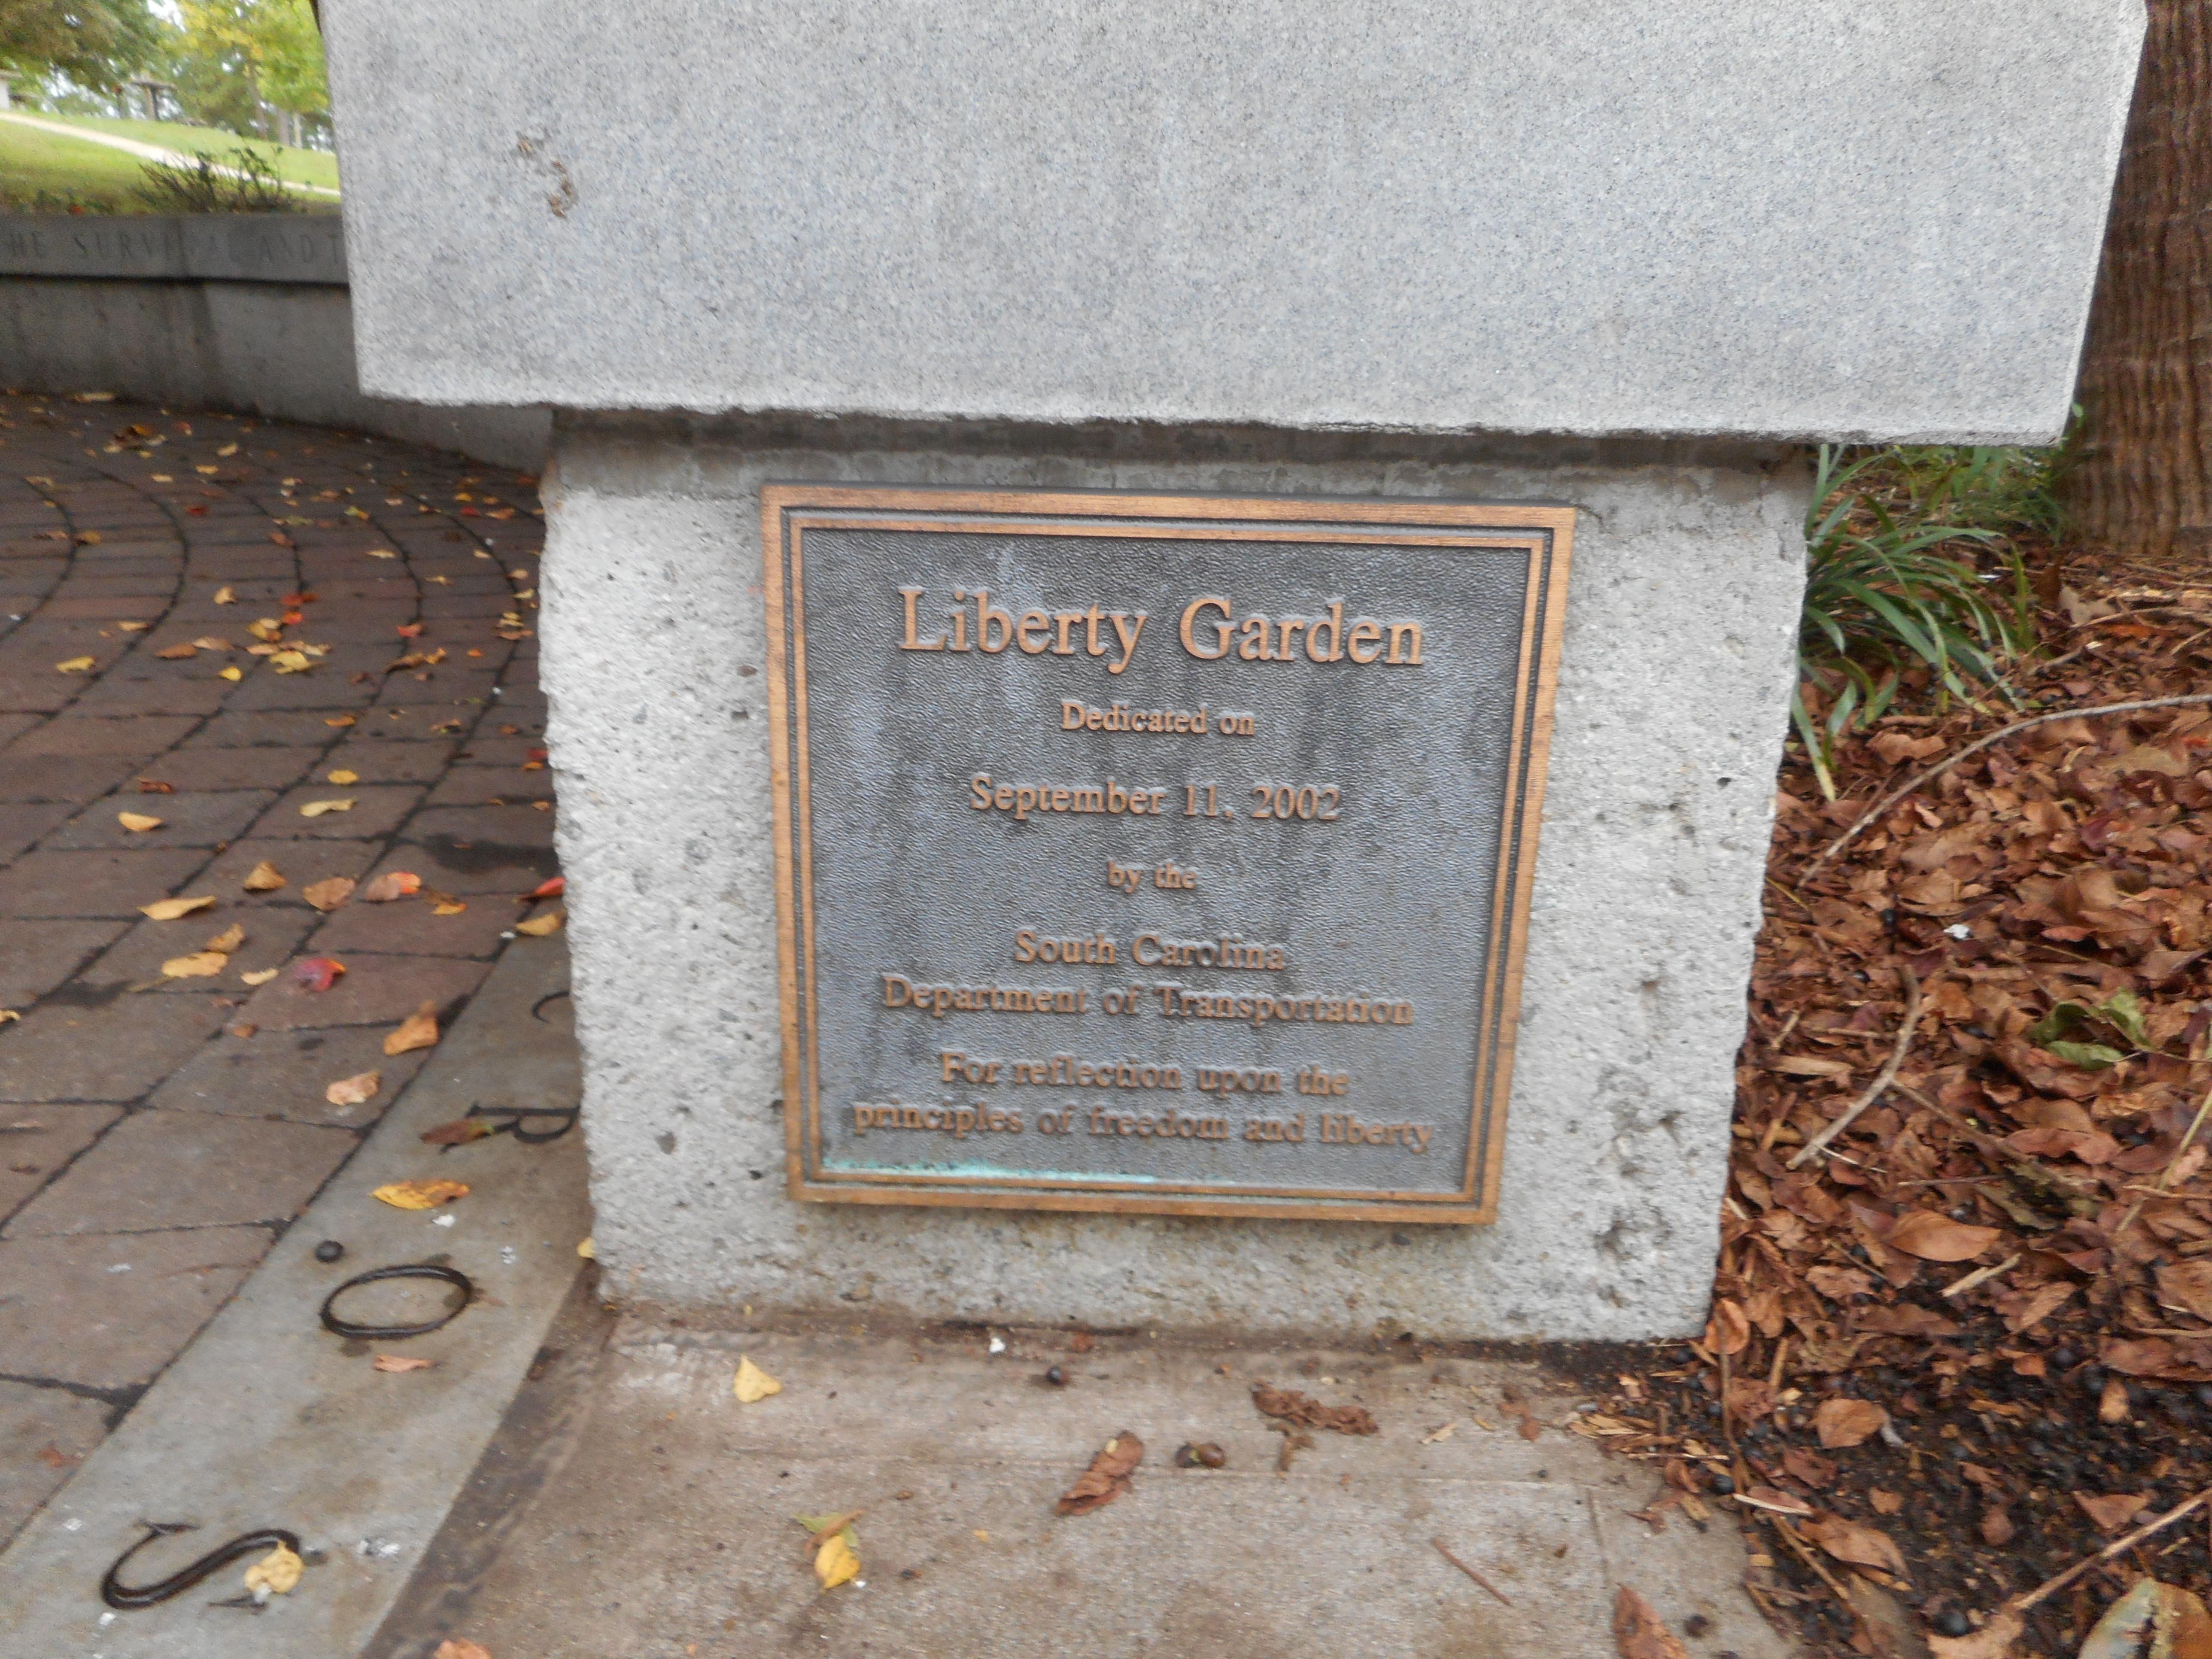 filei 95 santee sc nb rest area liberty garden plaquejpg - Liberty Garden